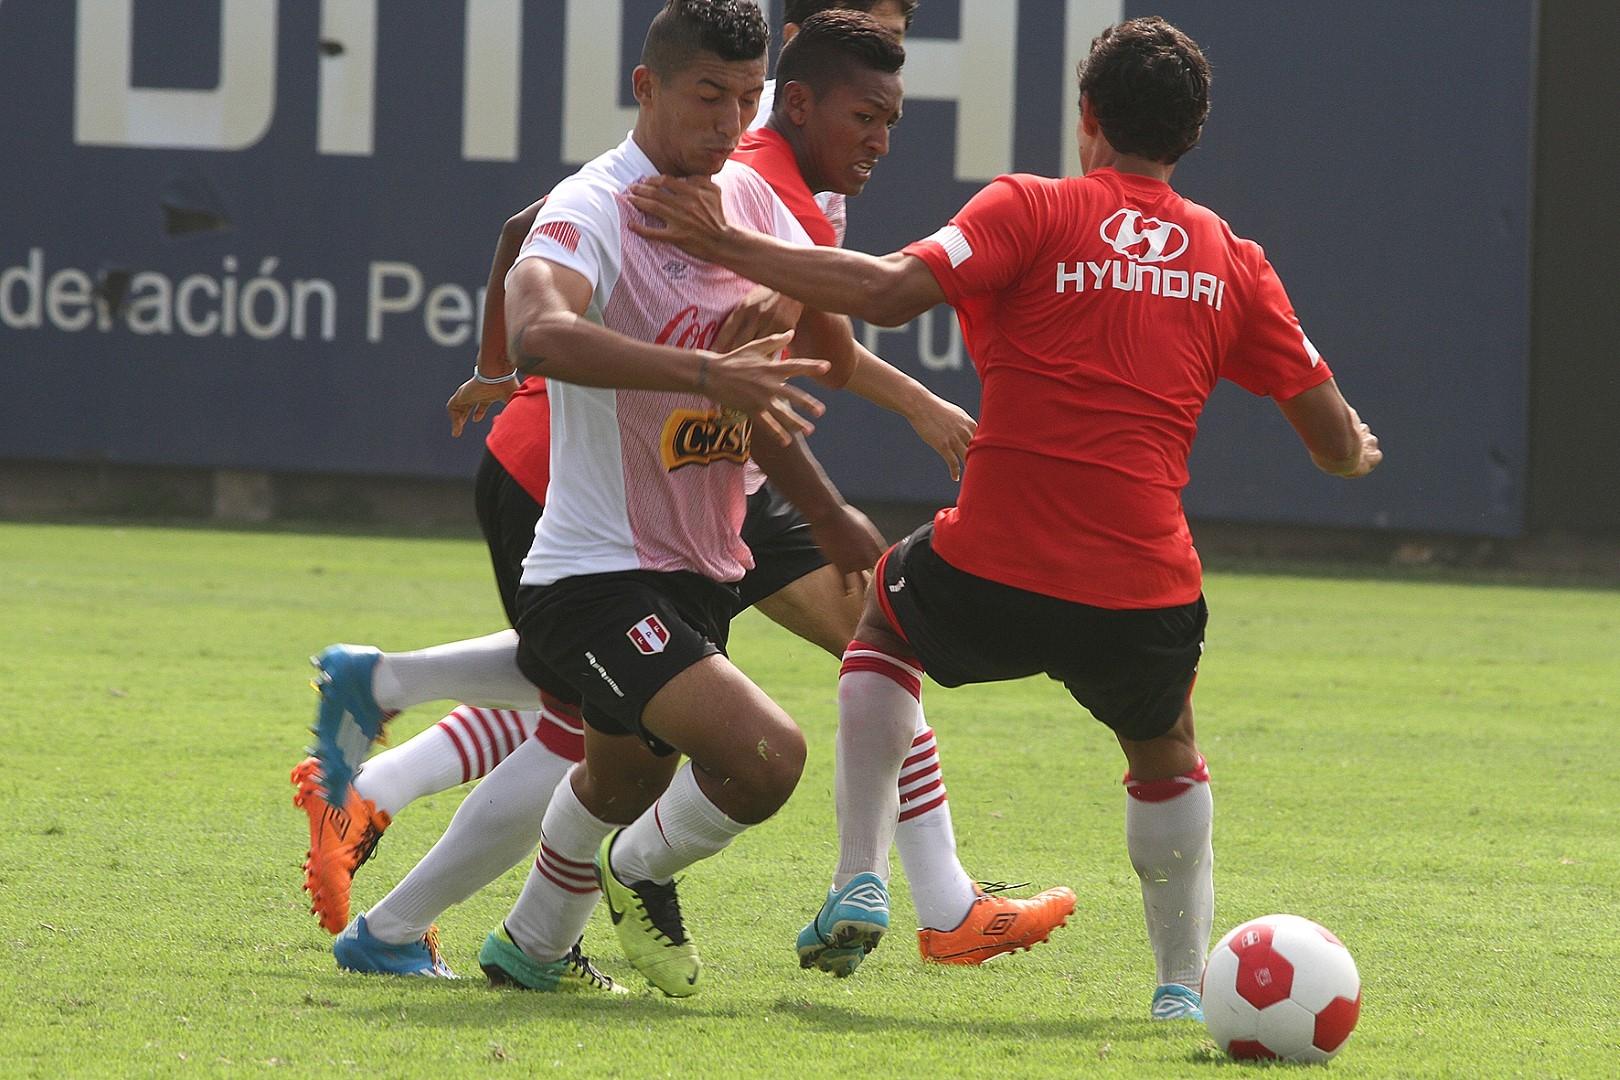 Hinostroza anotó dos goles. (Fotos: FPF)